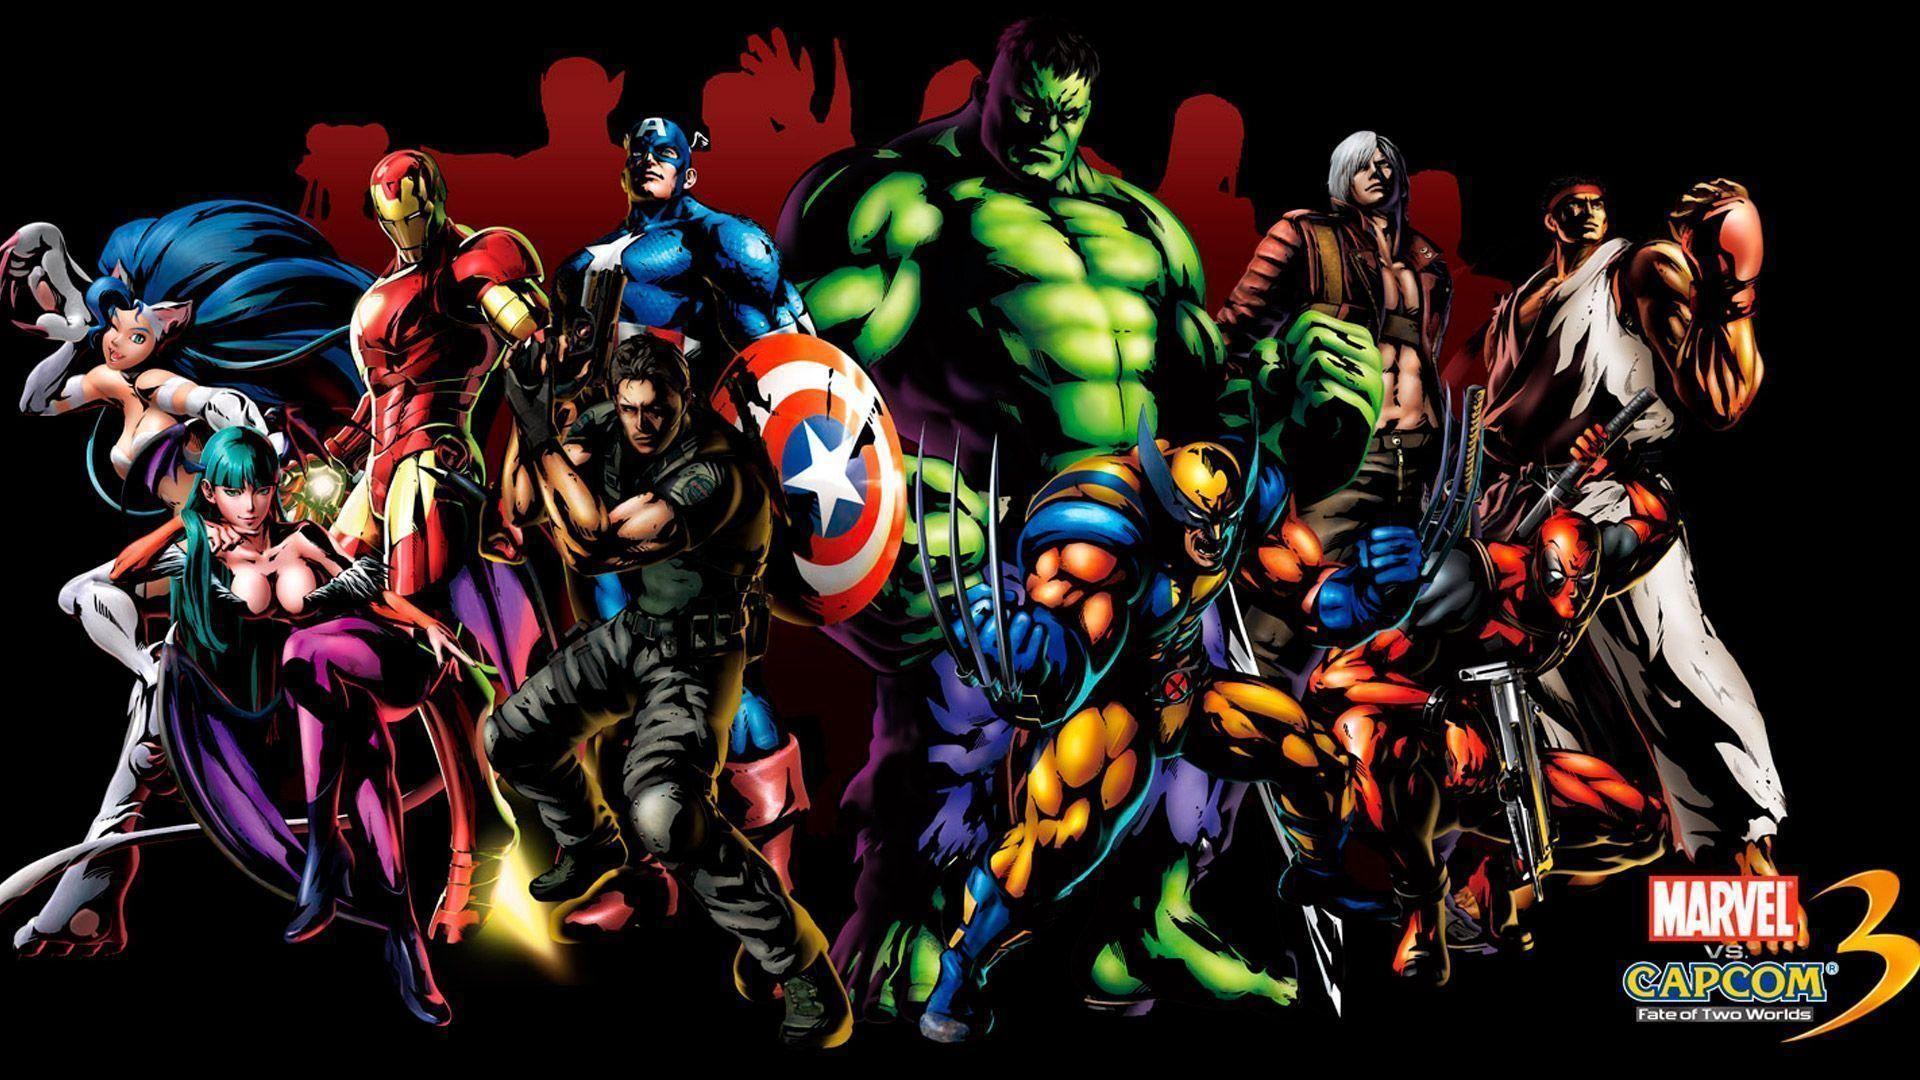 Marvel Super Heroes Wallpaper In 2020 Marvel Comics Wallpaper Superhero Wallpaper Avengers Wallpaper